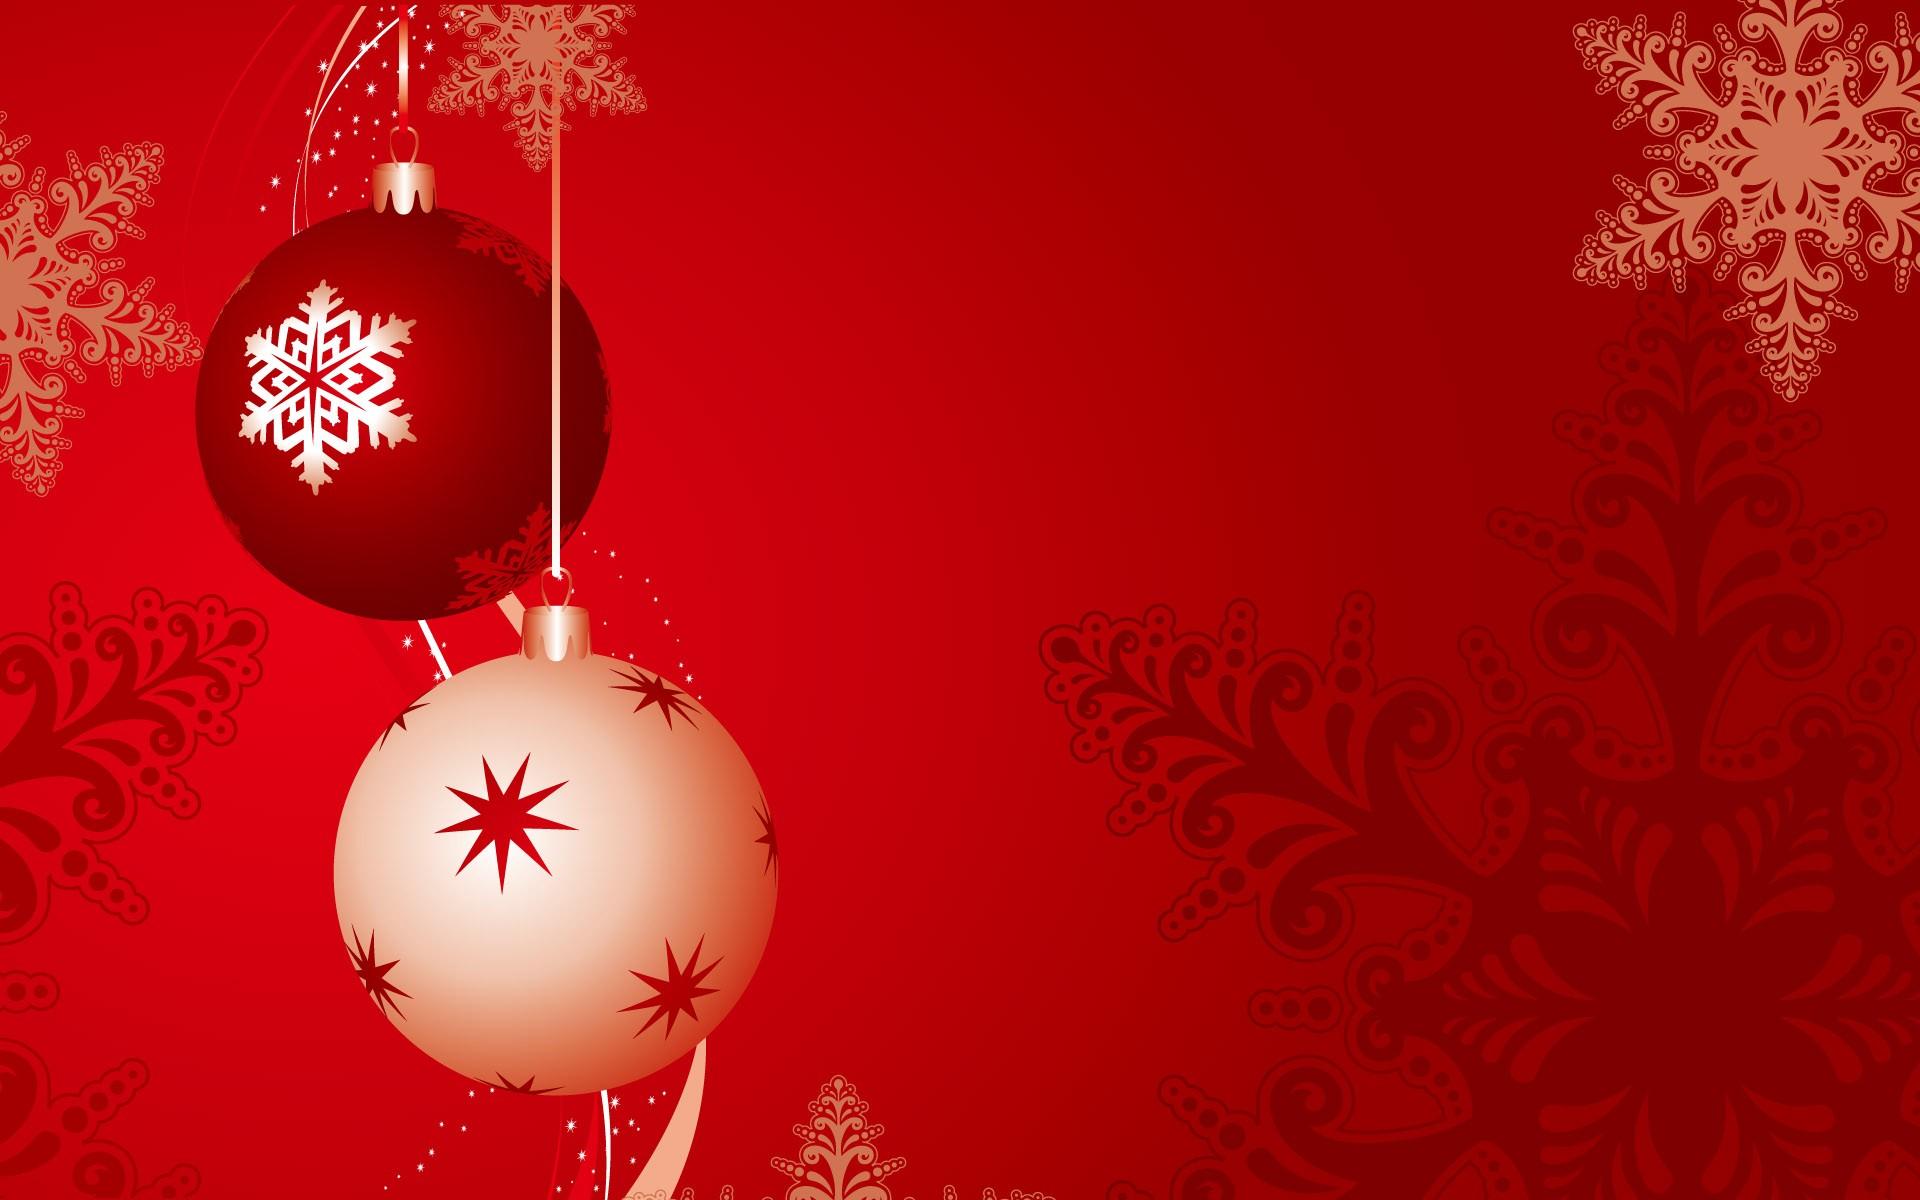 Картинки Рождество, дизайн фото и обои на рабочий стол